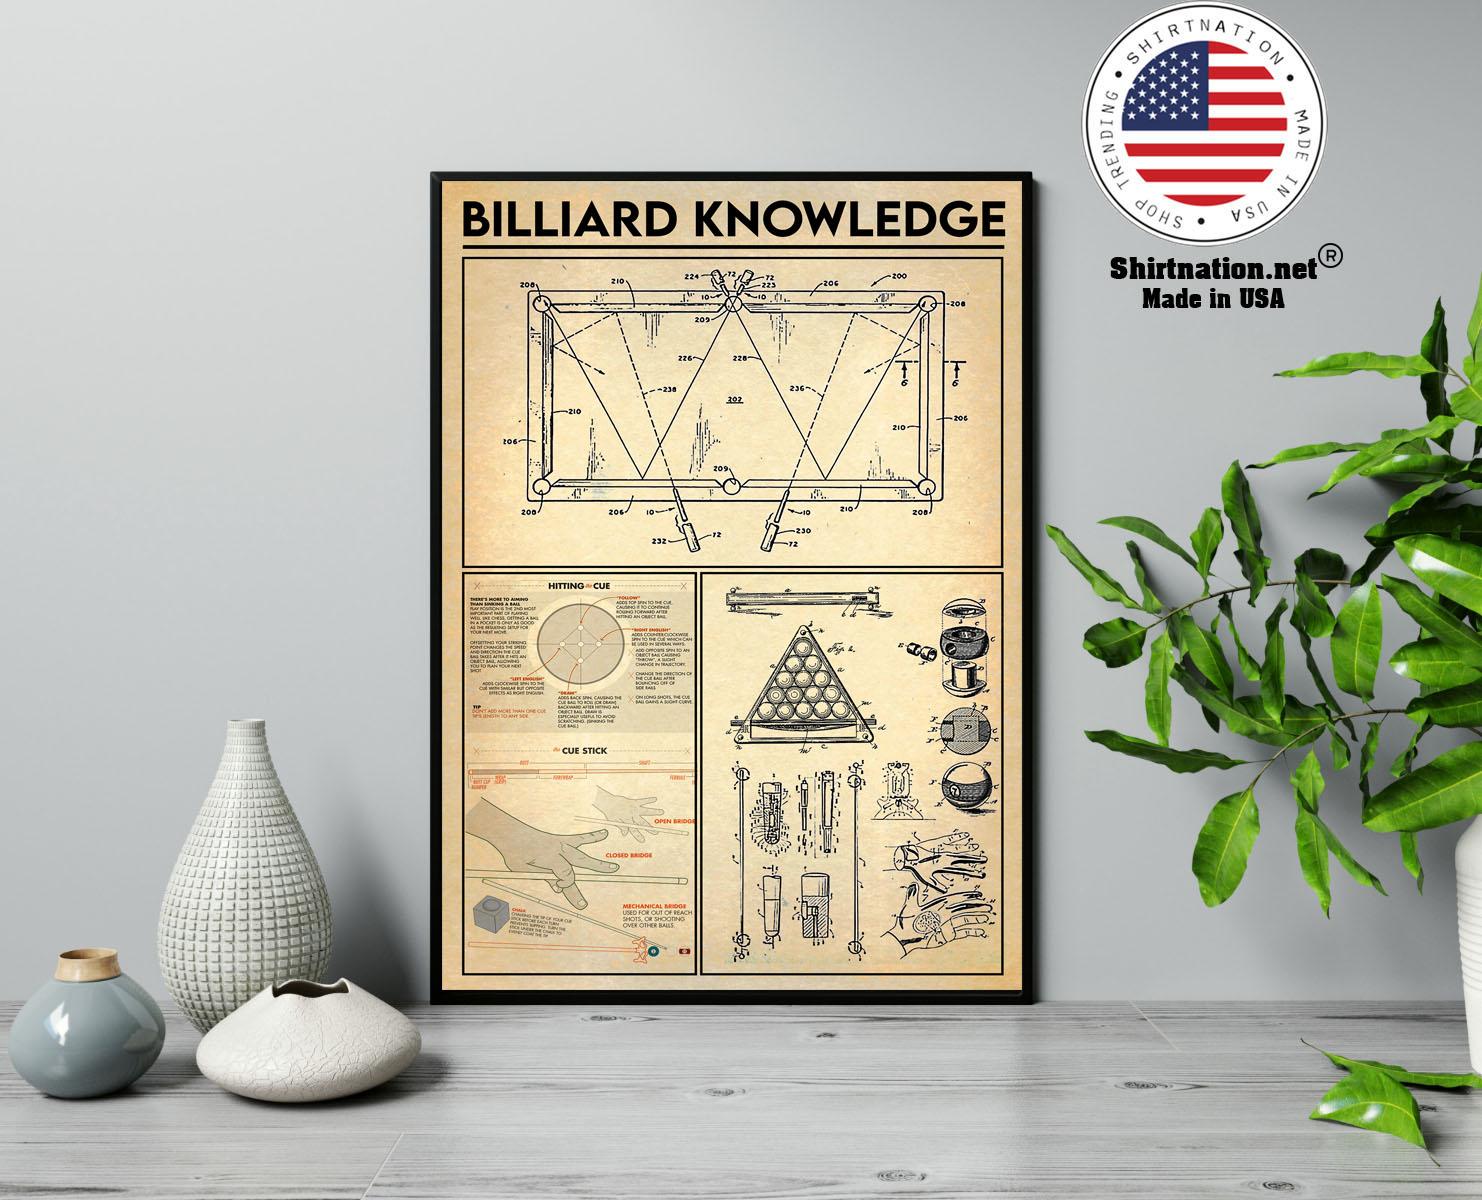 Billiard knowledge poster 13